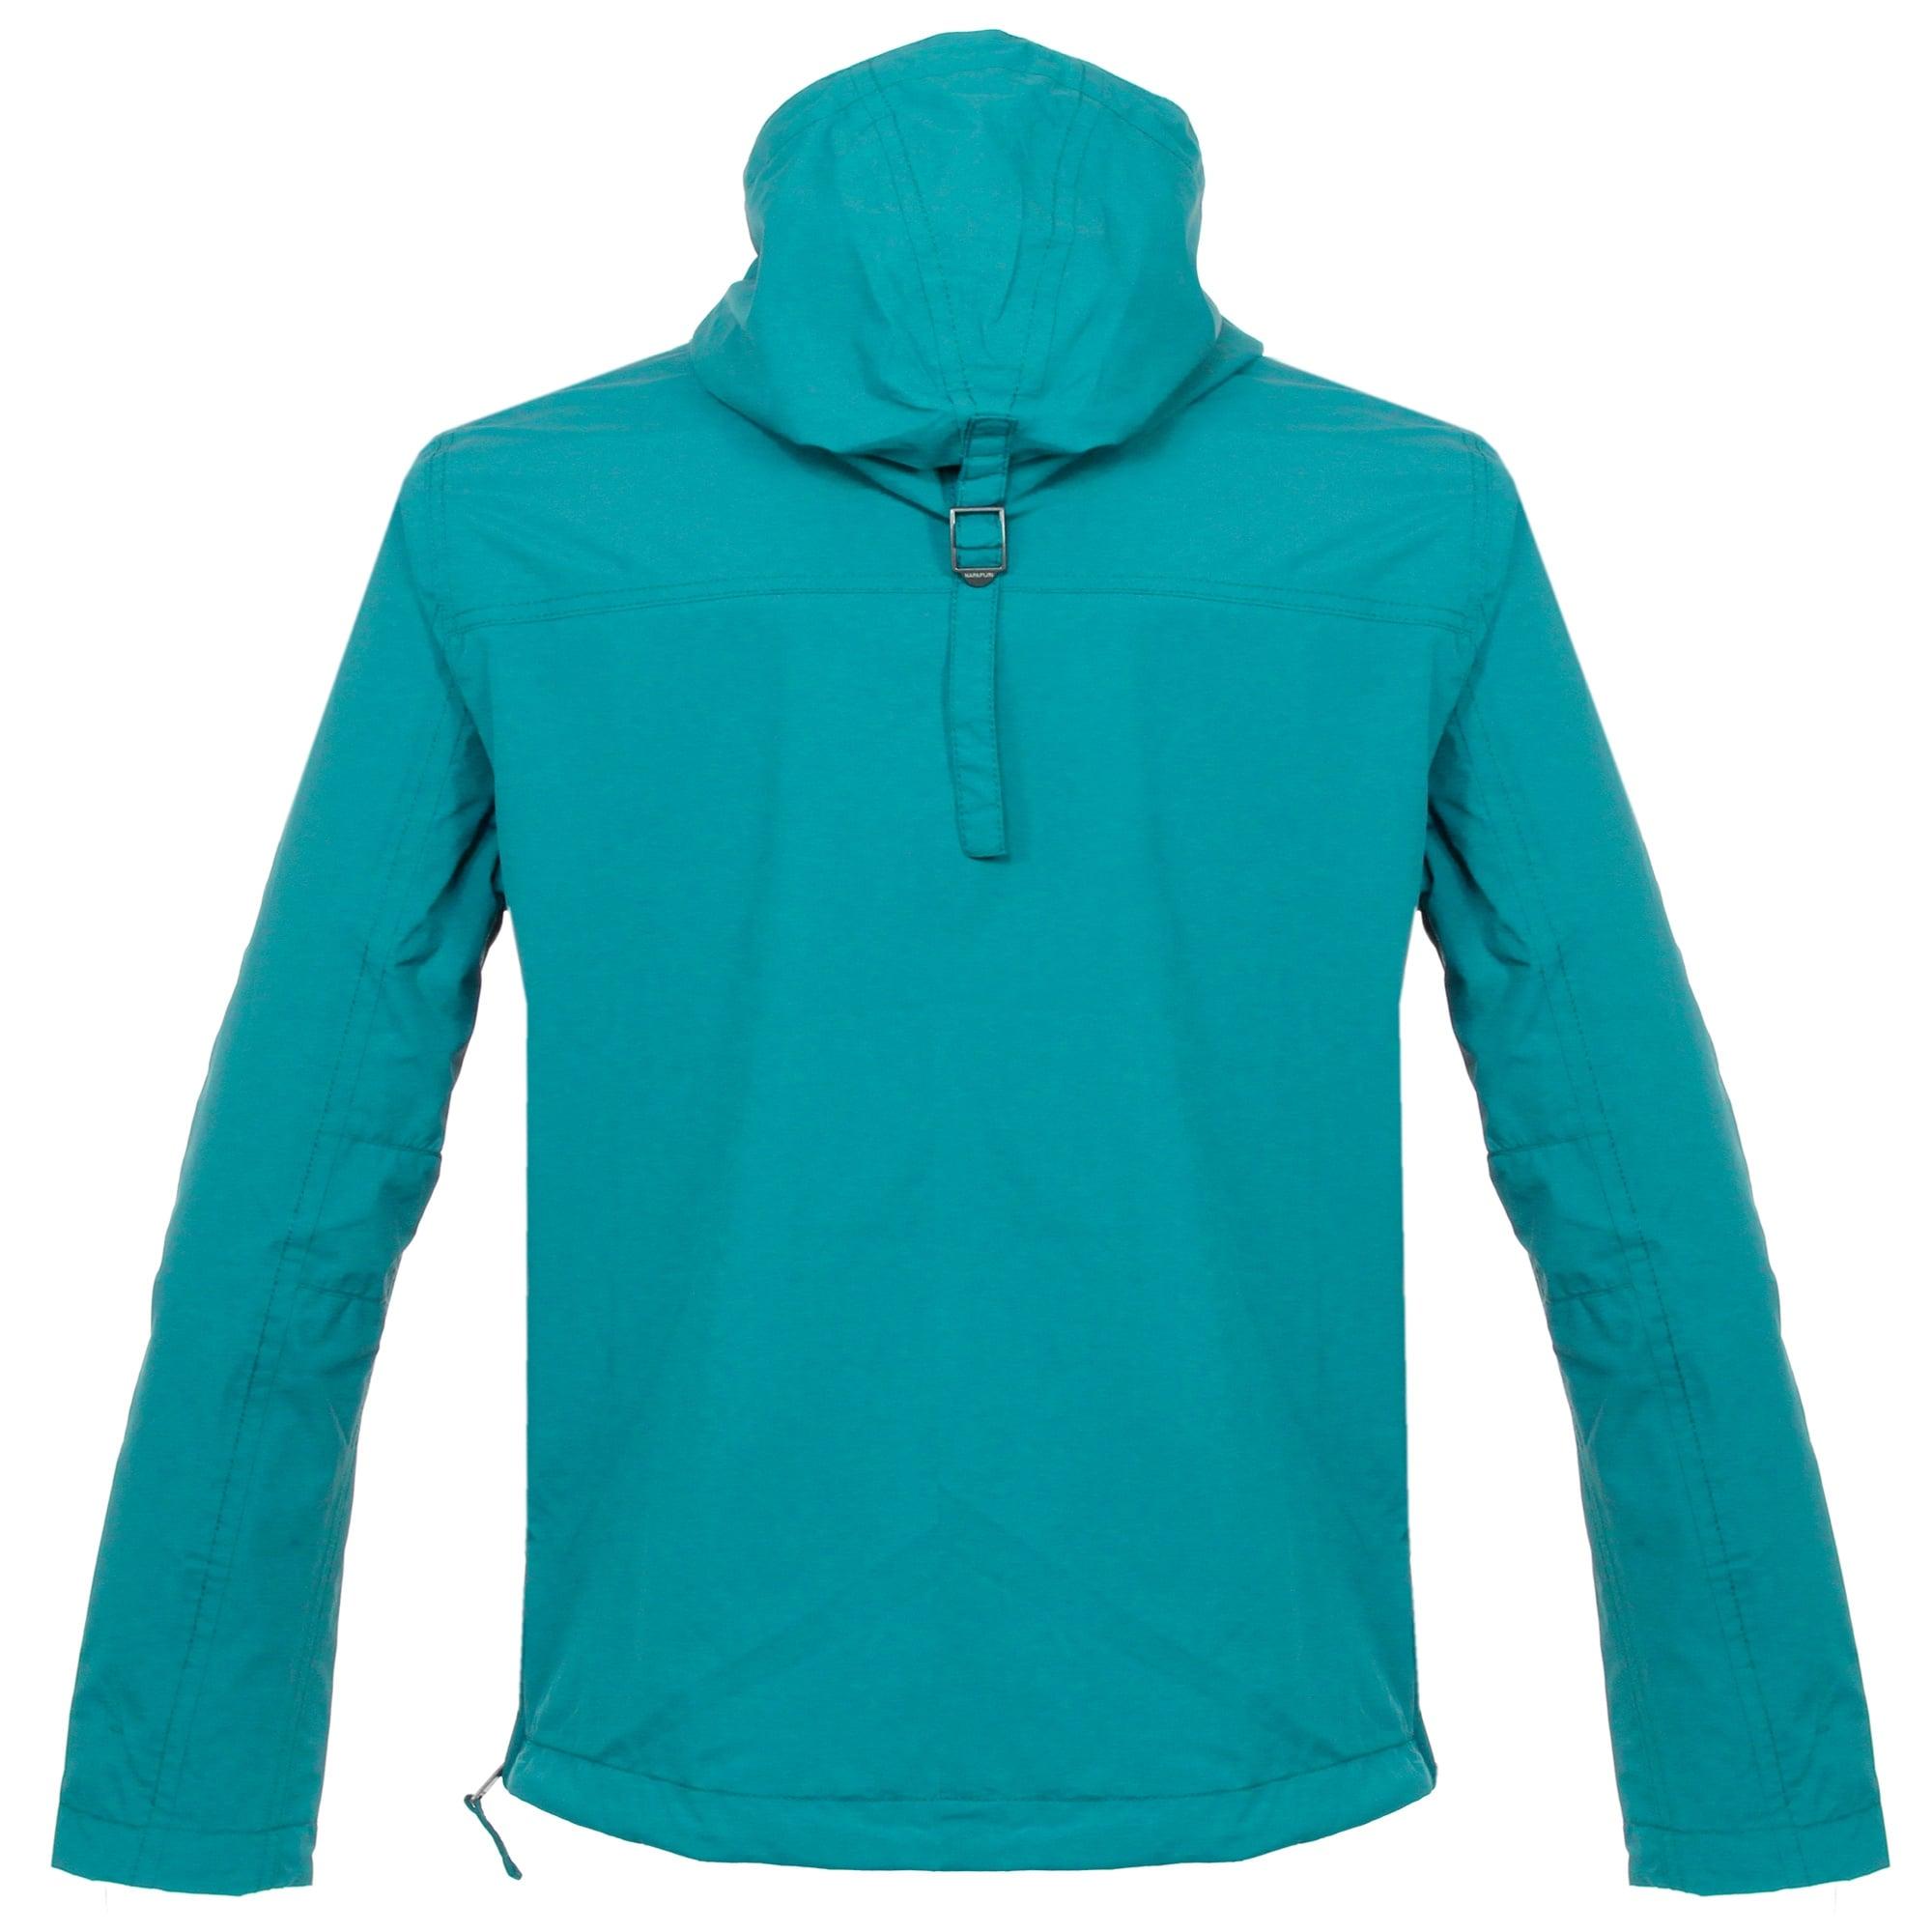 Napapijri Rainforest Summer Caribbean Blue Cagoule Jacket